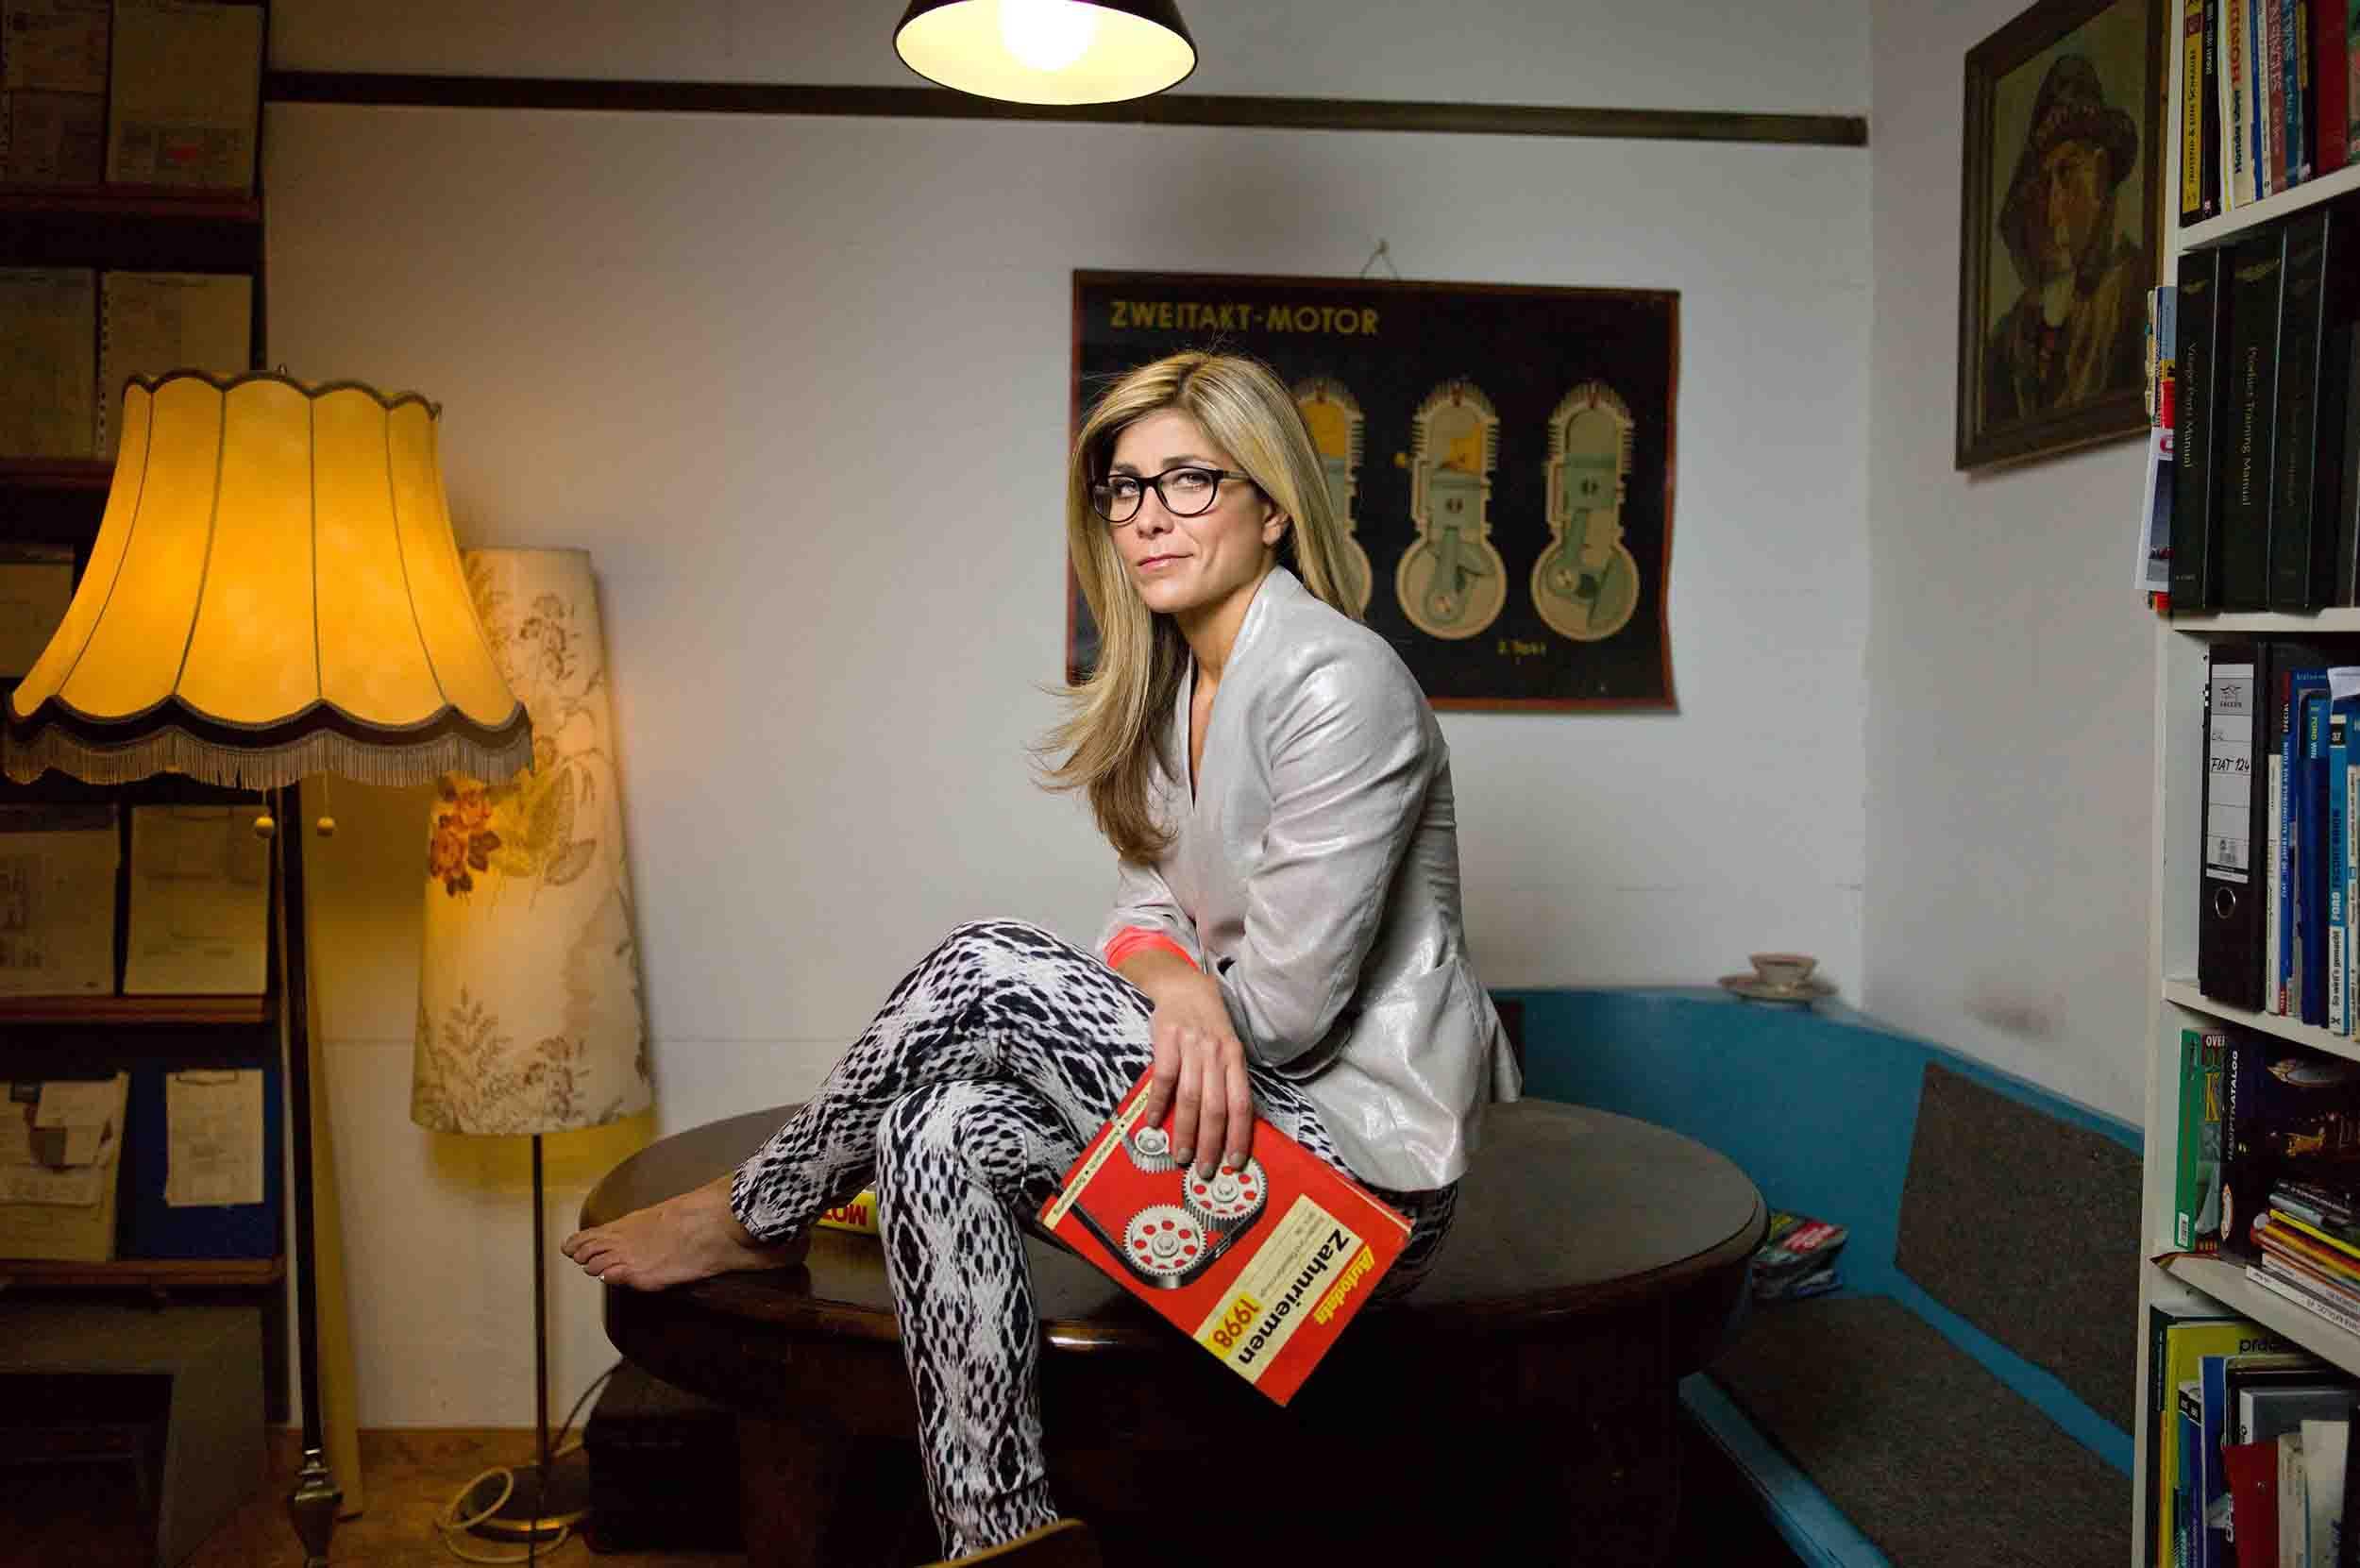 Panagiota Petridou: Worauf achten beim Autokauf?